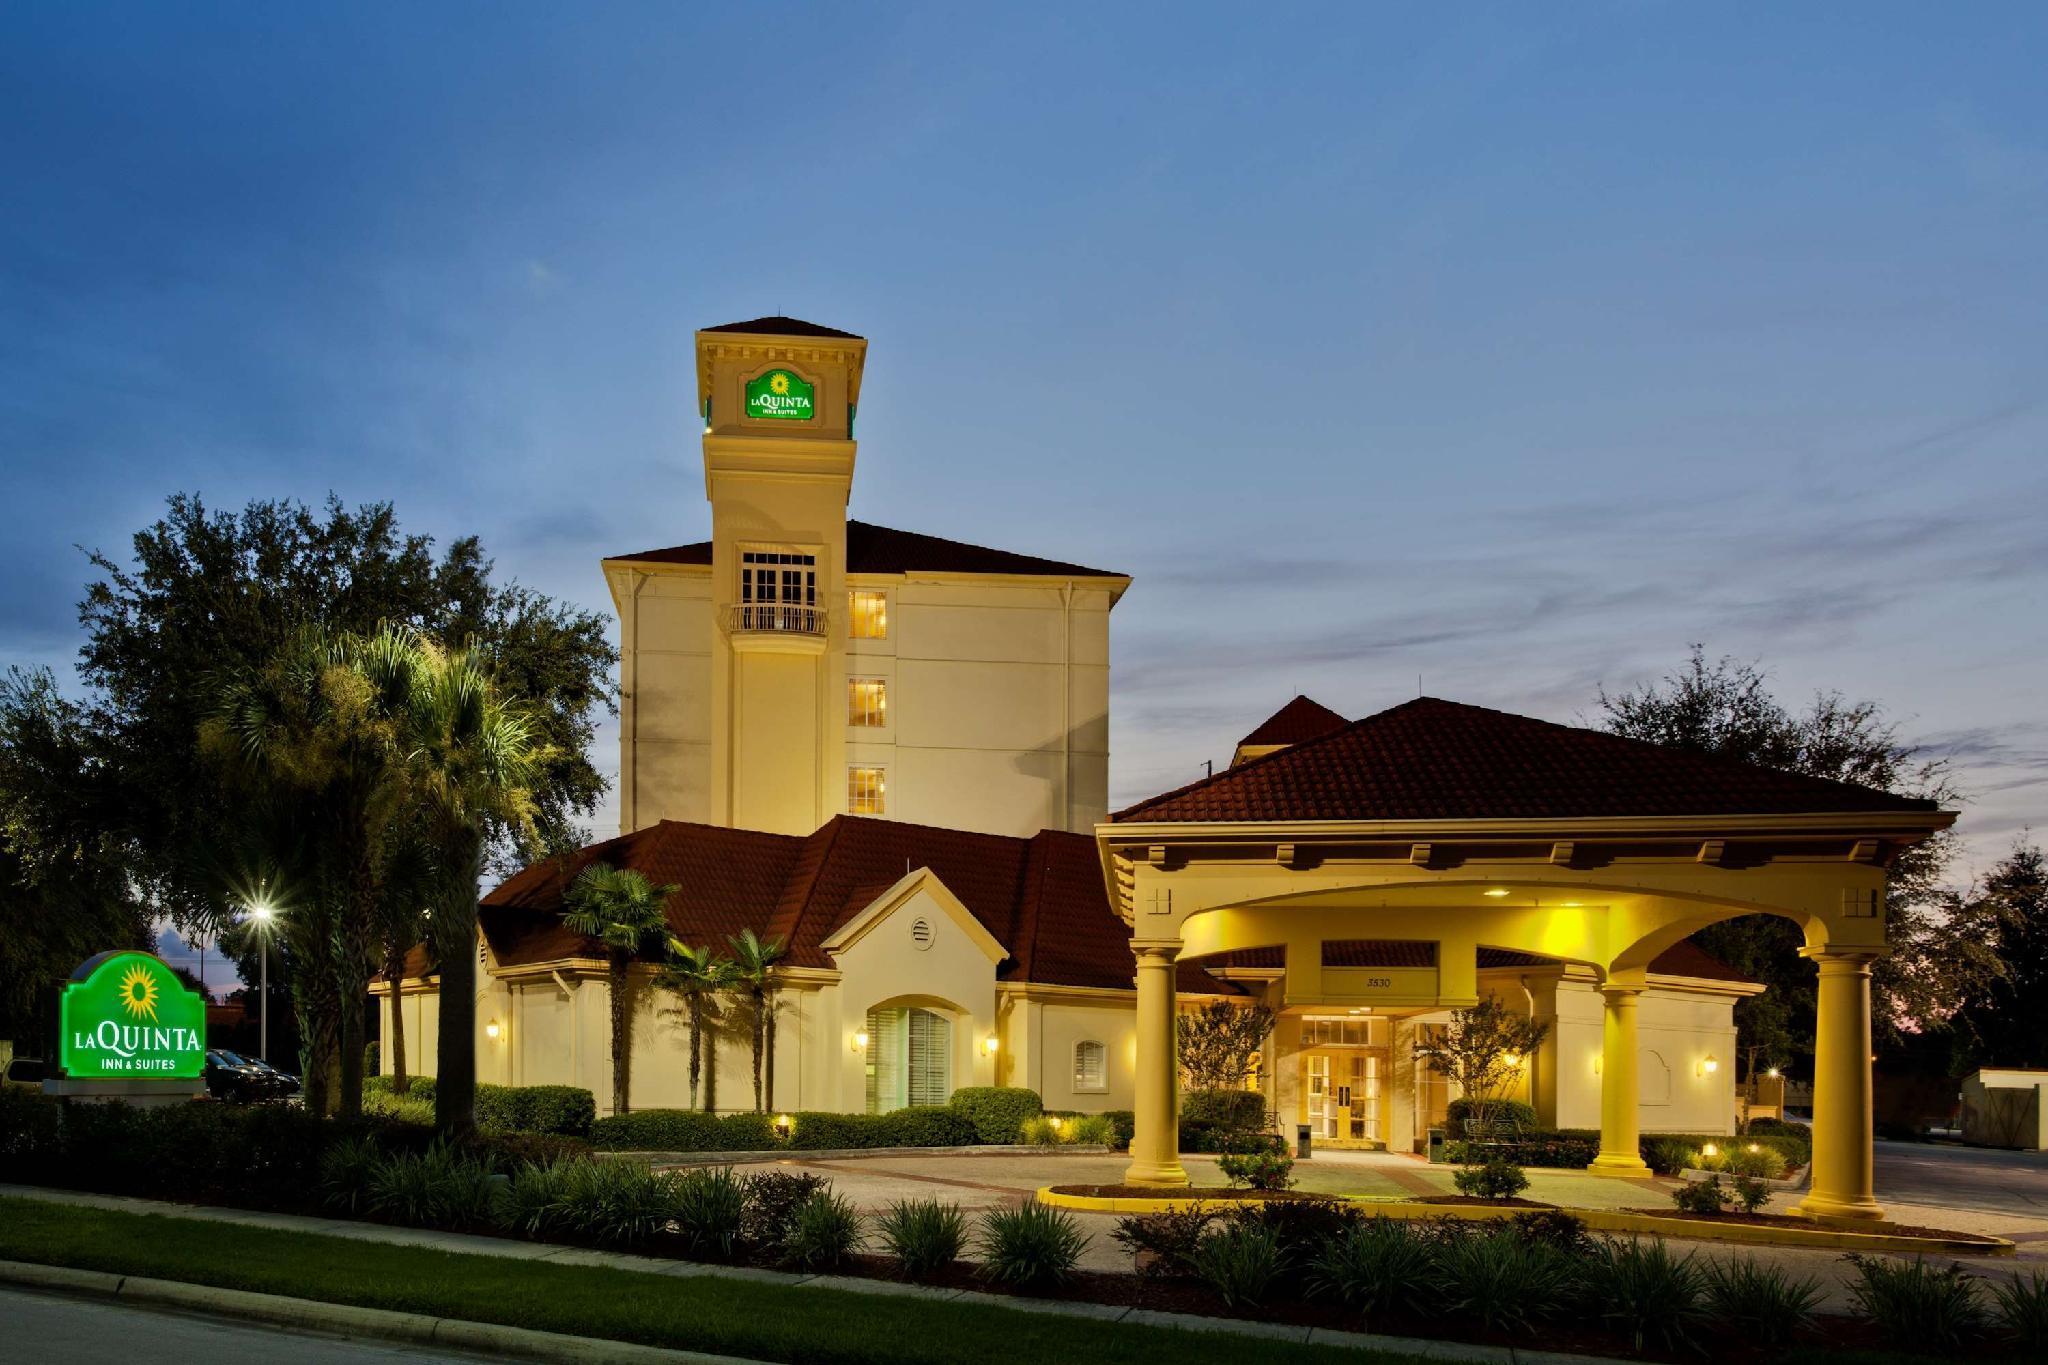 La Quinta Inn And Suites By Wyndham Ocala